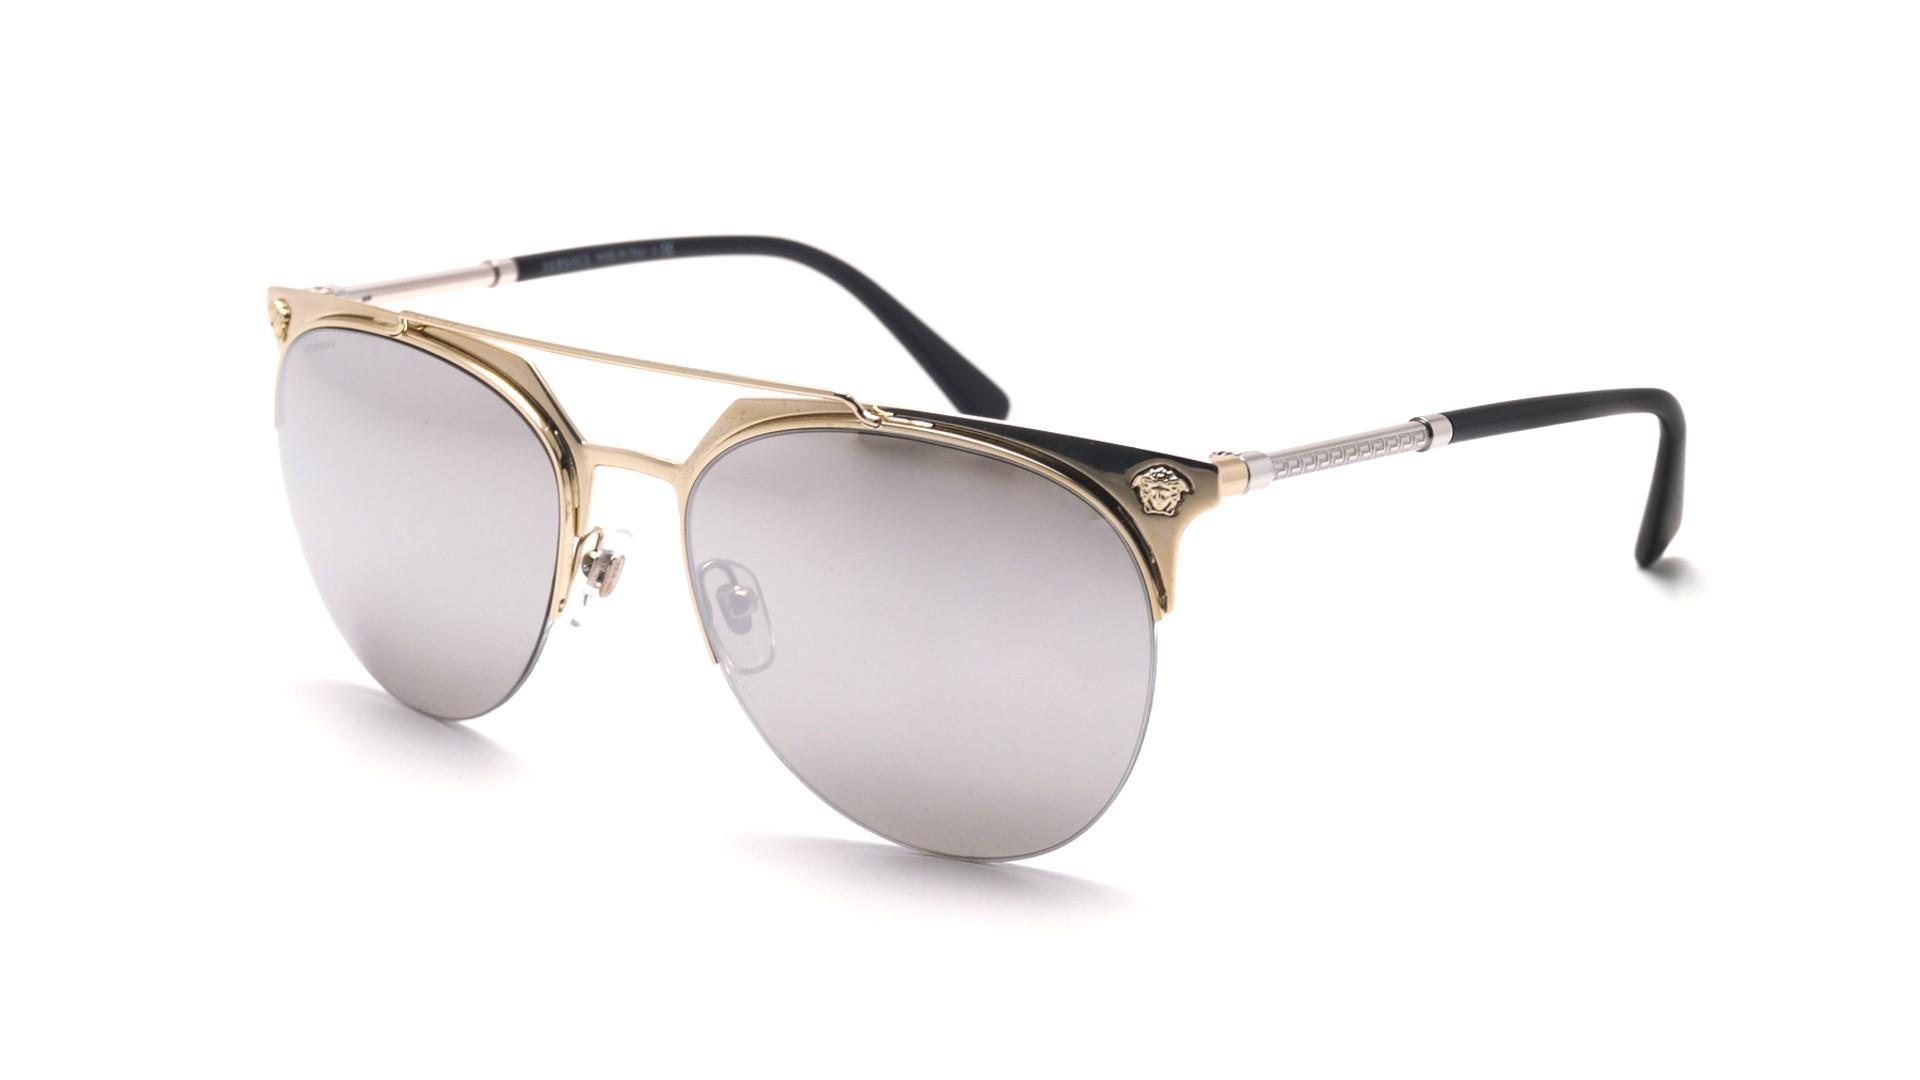 4d4ae20492 Sunglasses Versace Frenergy Gold VE2181 1252 6G 57-18 Large Mirror